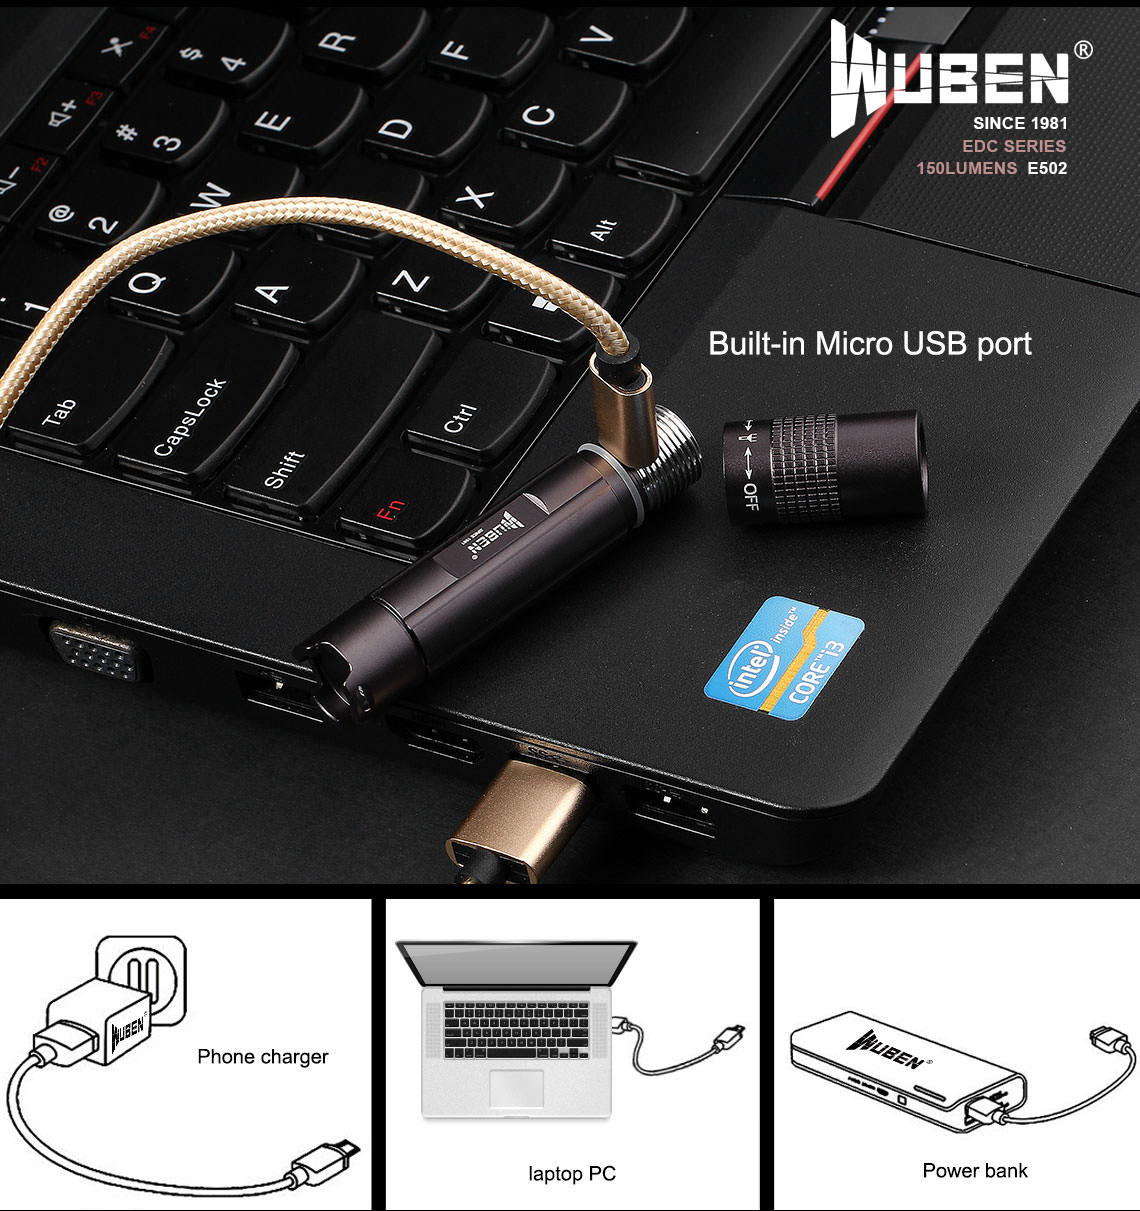 wuben e502 flashlight online